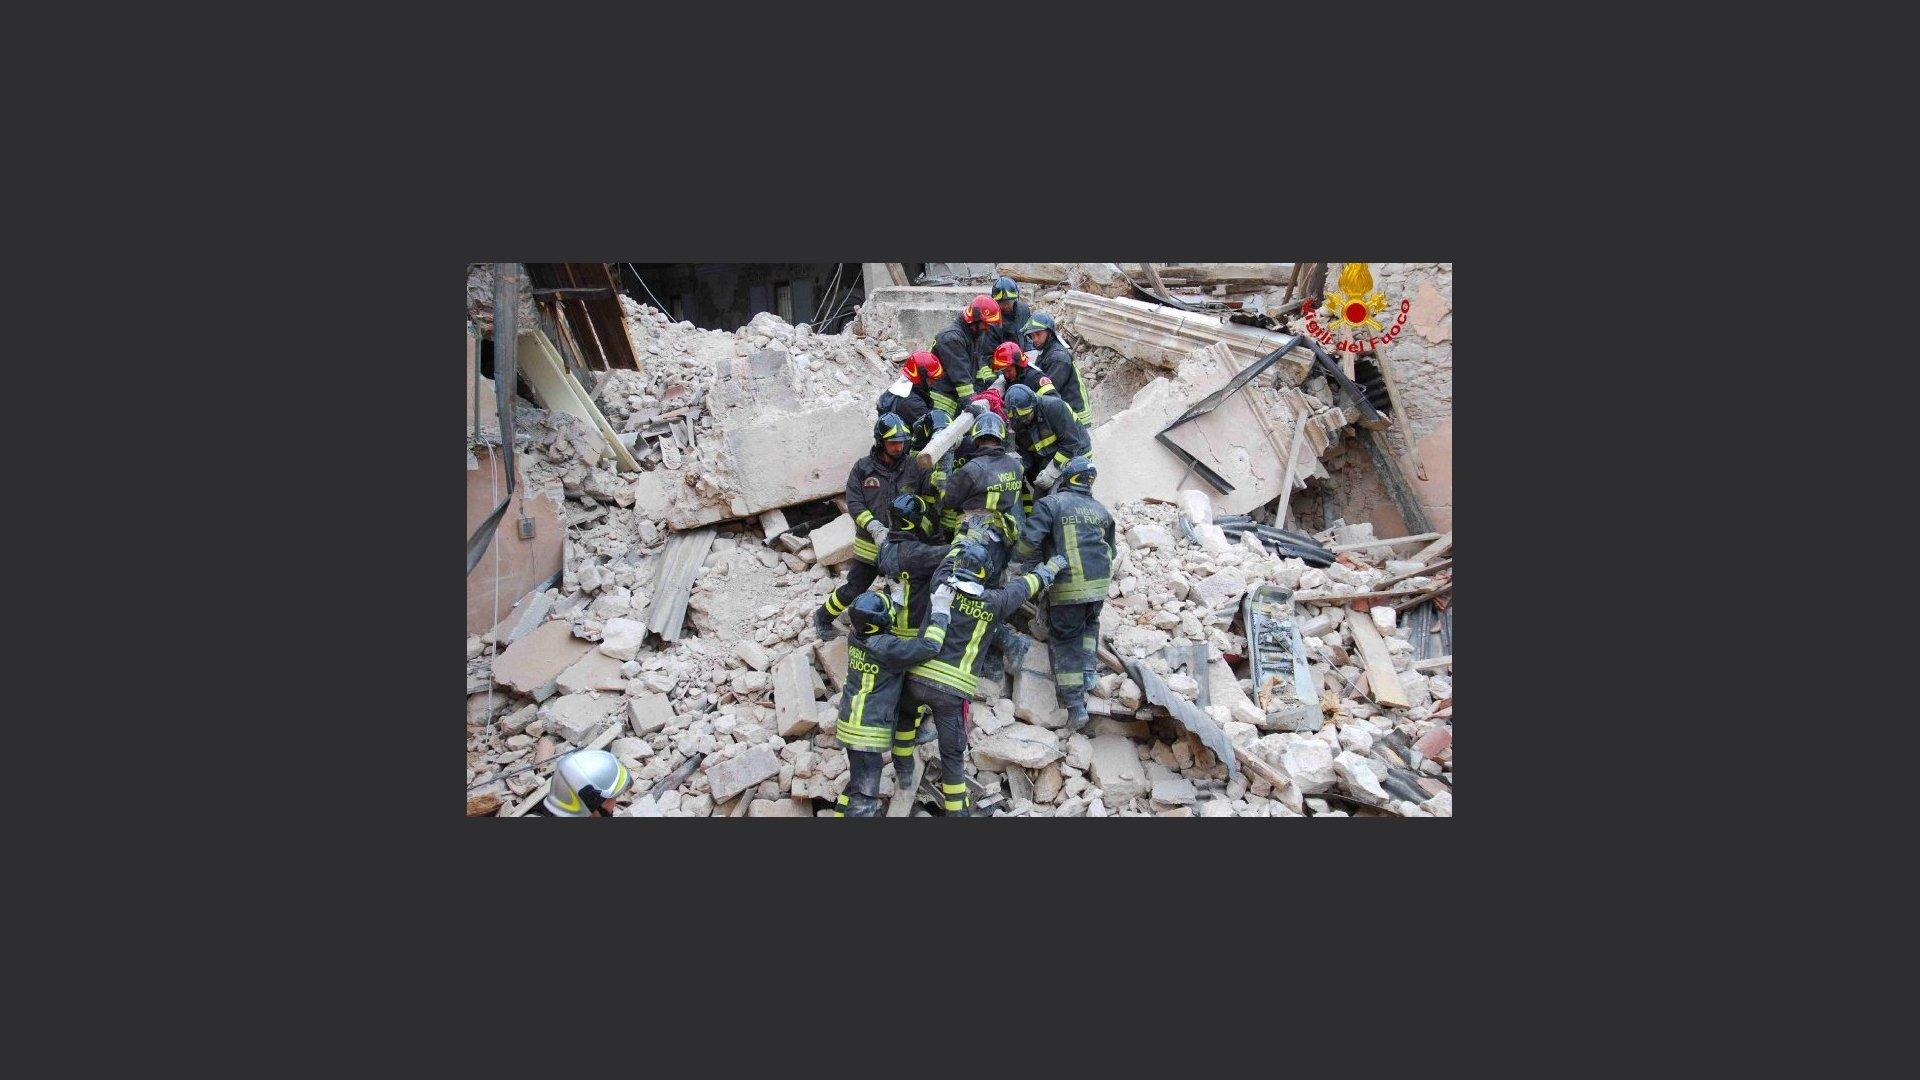 L'Aquila, 12 anni fa tragedia del sisma. Sindaco: